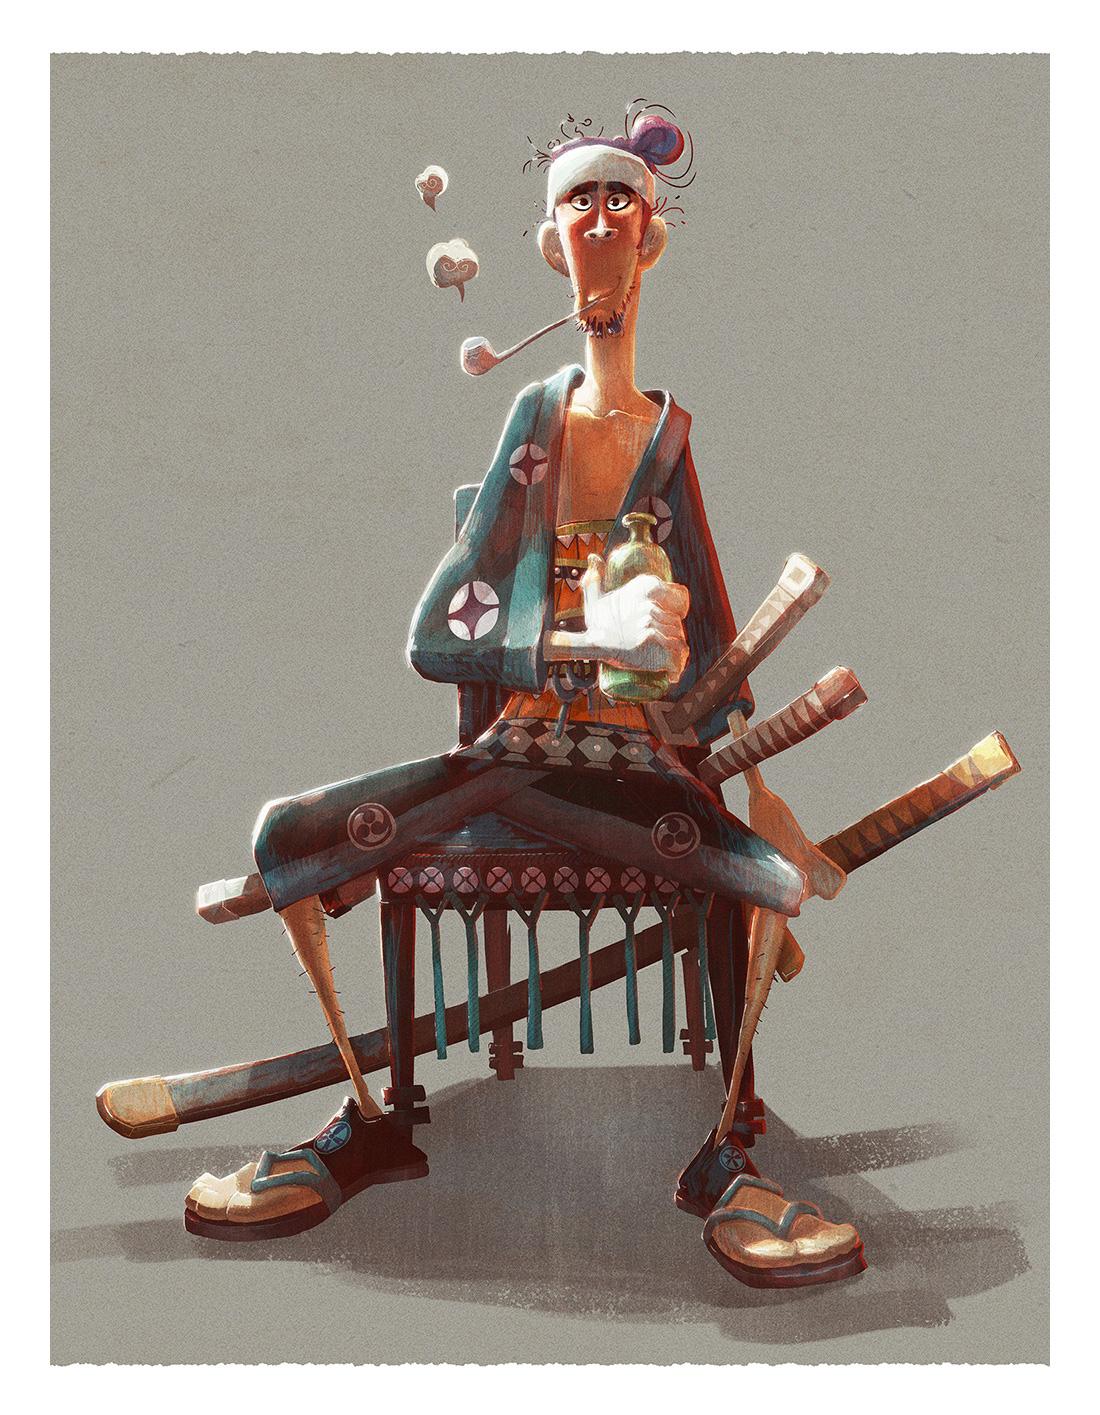 Samurai Concept Art and Illustration I